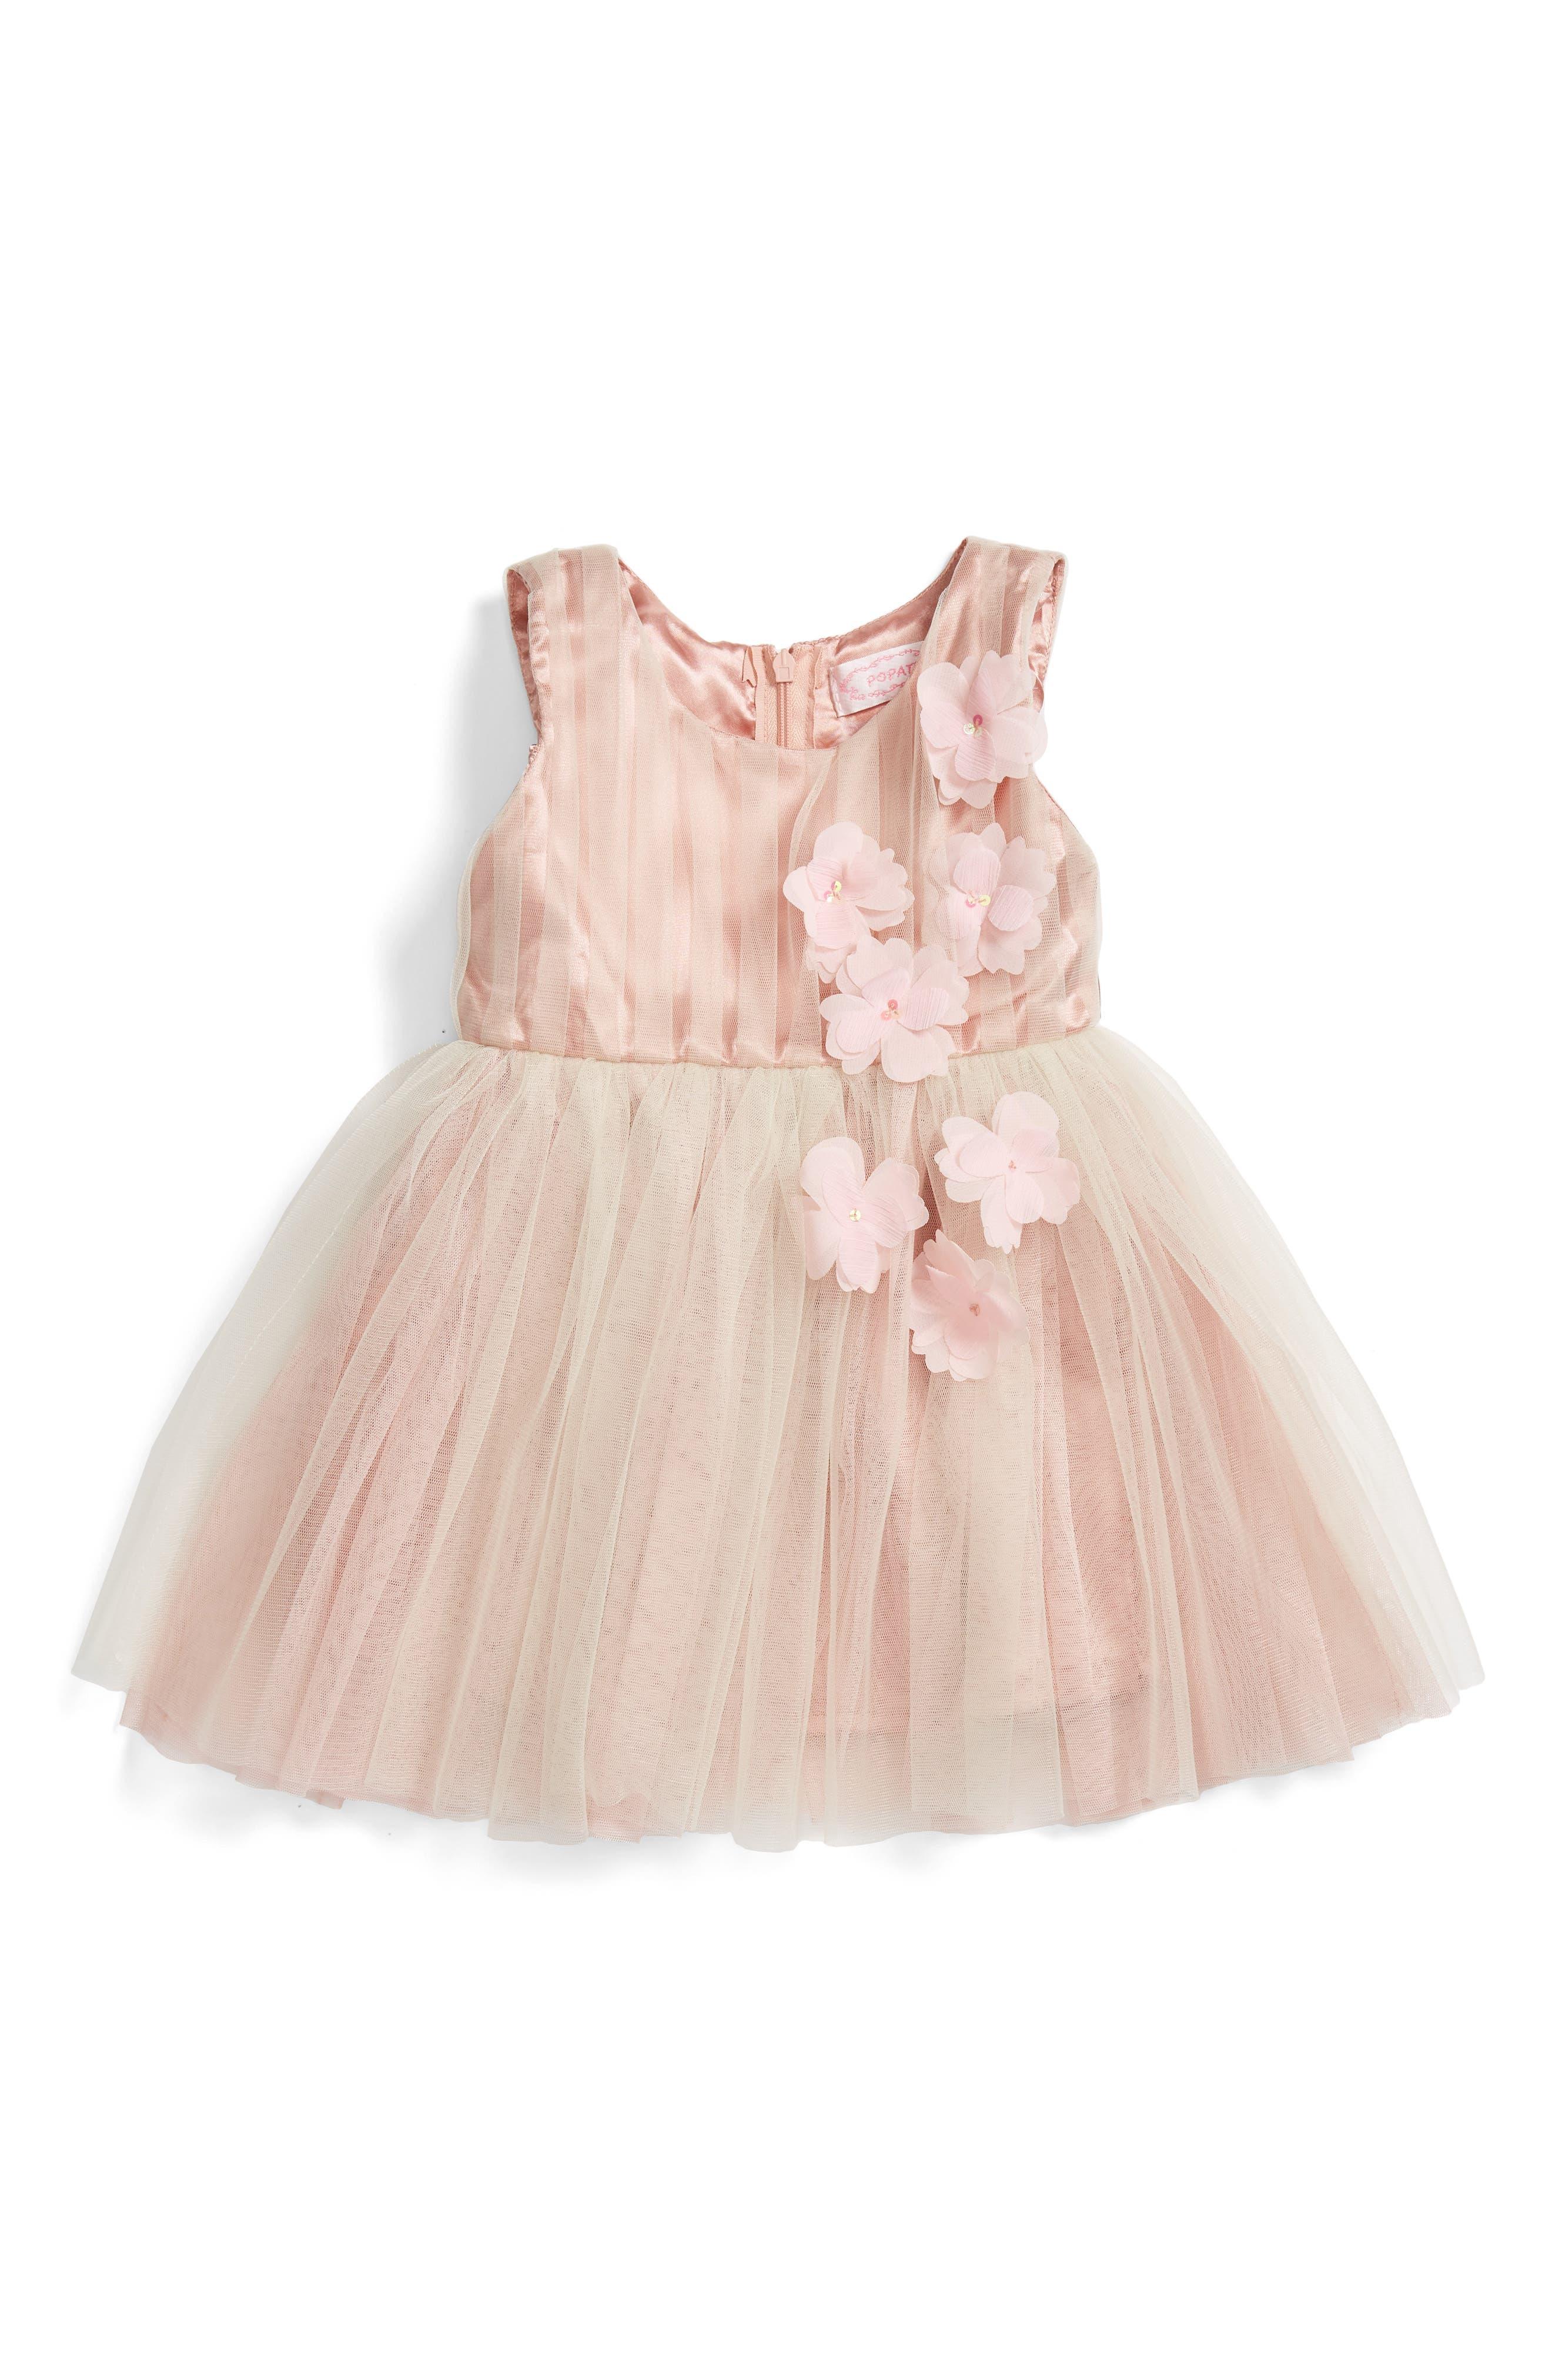 POPATU, Sleeveless Rosette Tulle Dress, Alternate thumbnail 3, color, TAUPE